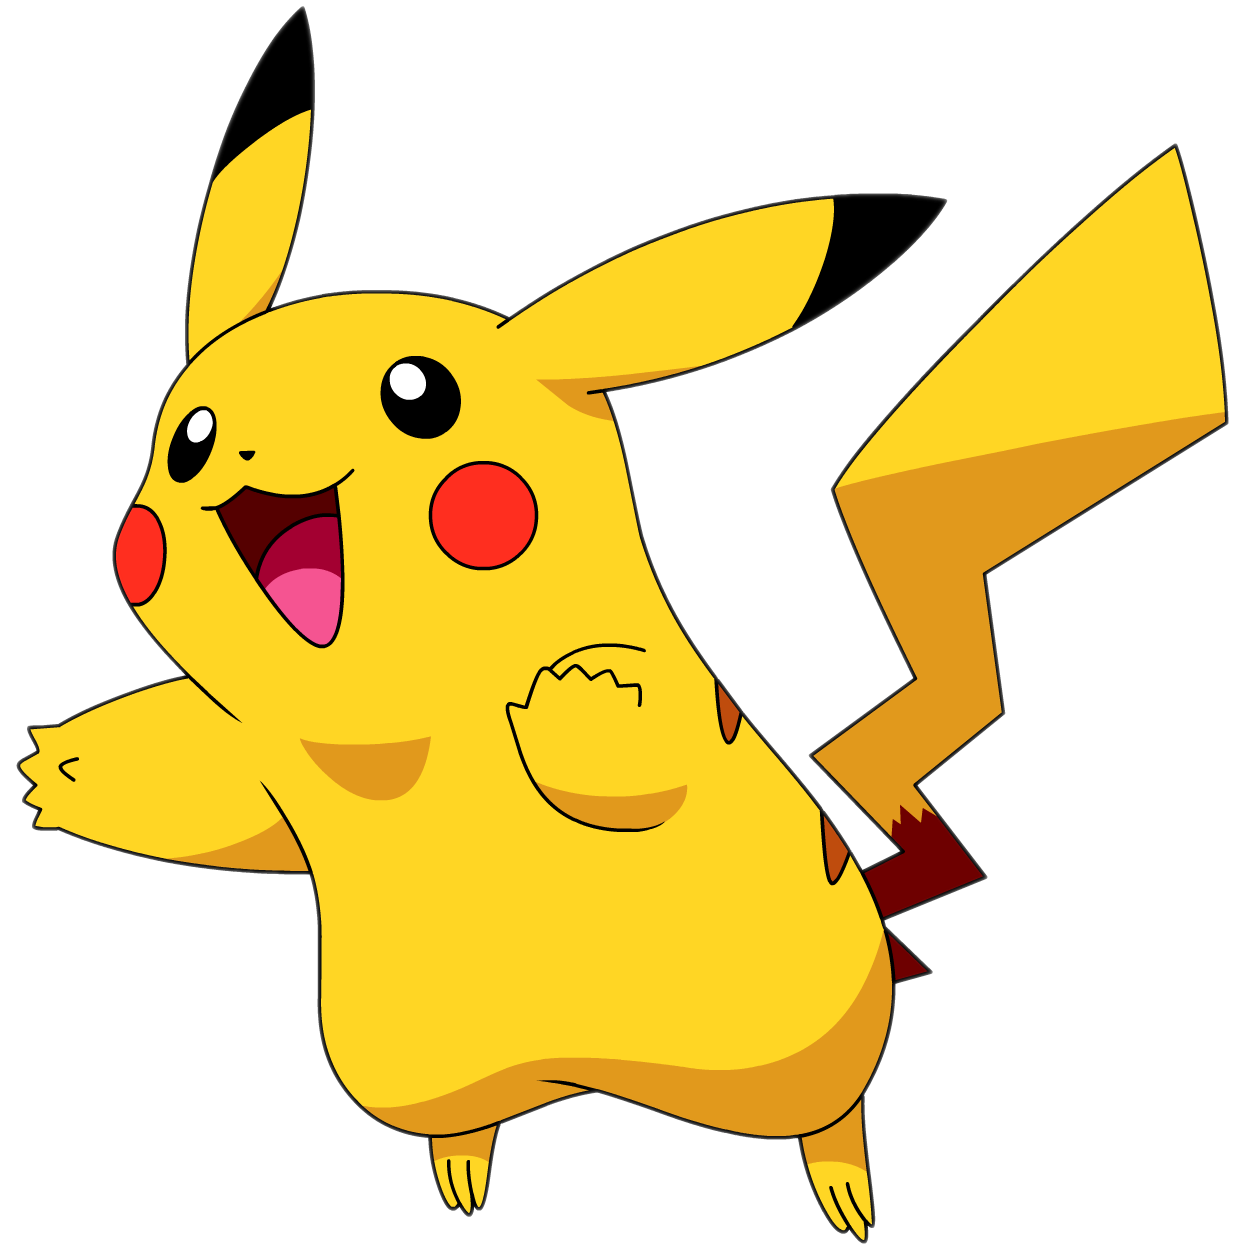 Cartoon Characters Png : Cartoon characters pokemon png s